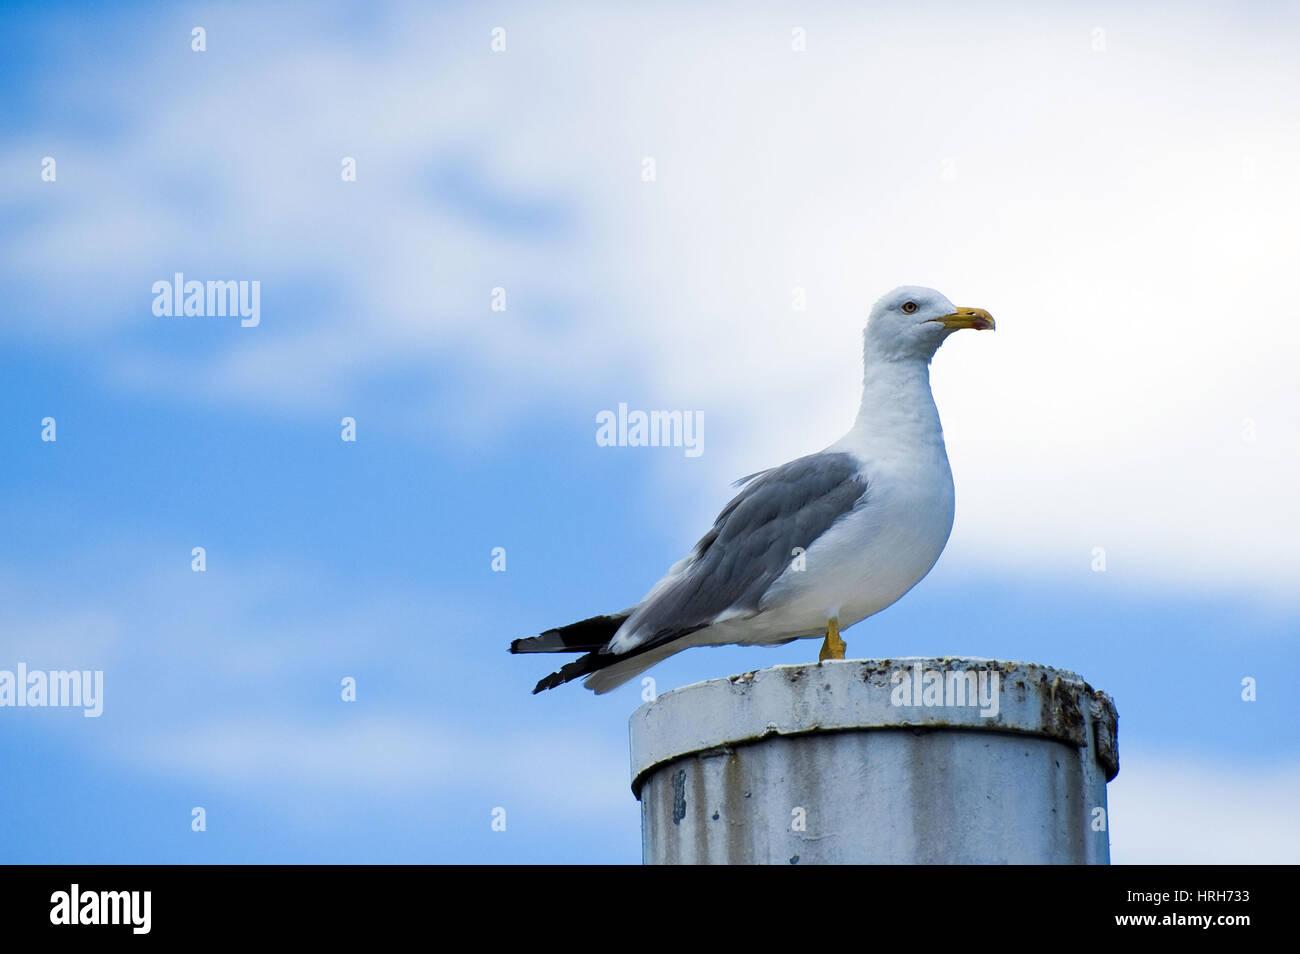 Moewe seagull Stock Photo: 134988423 Alamy